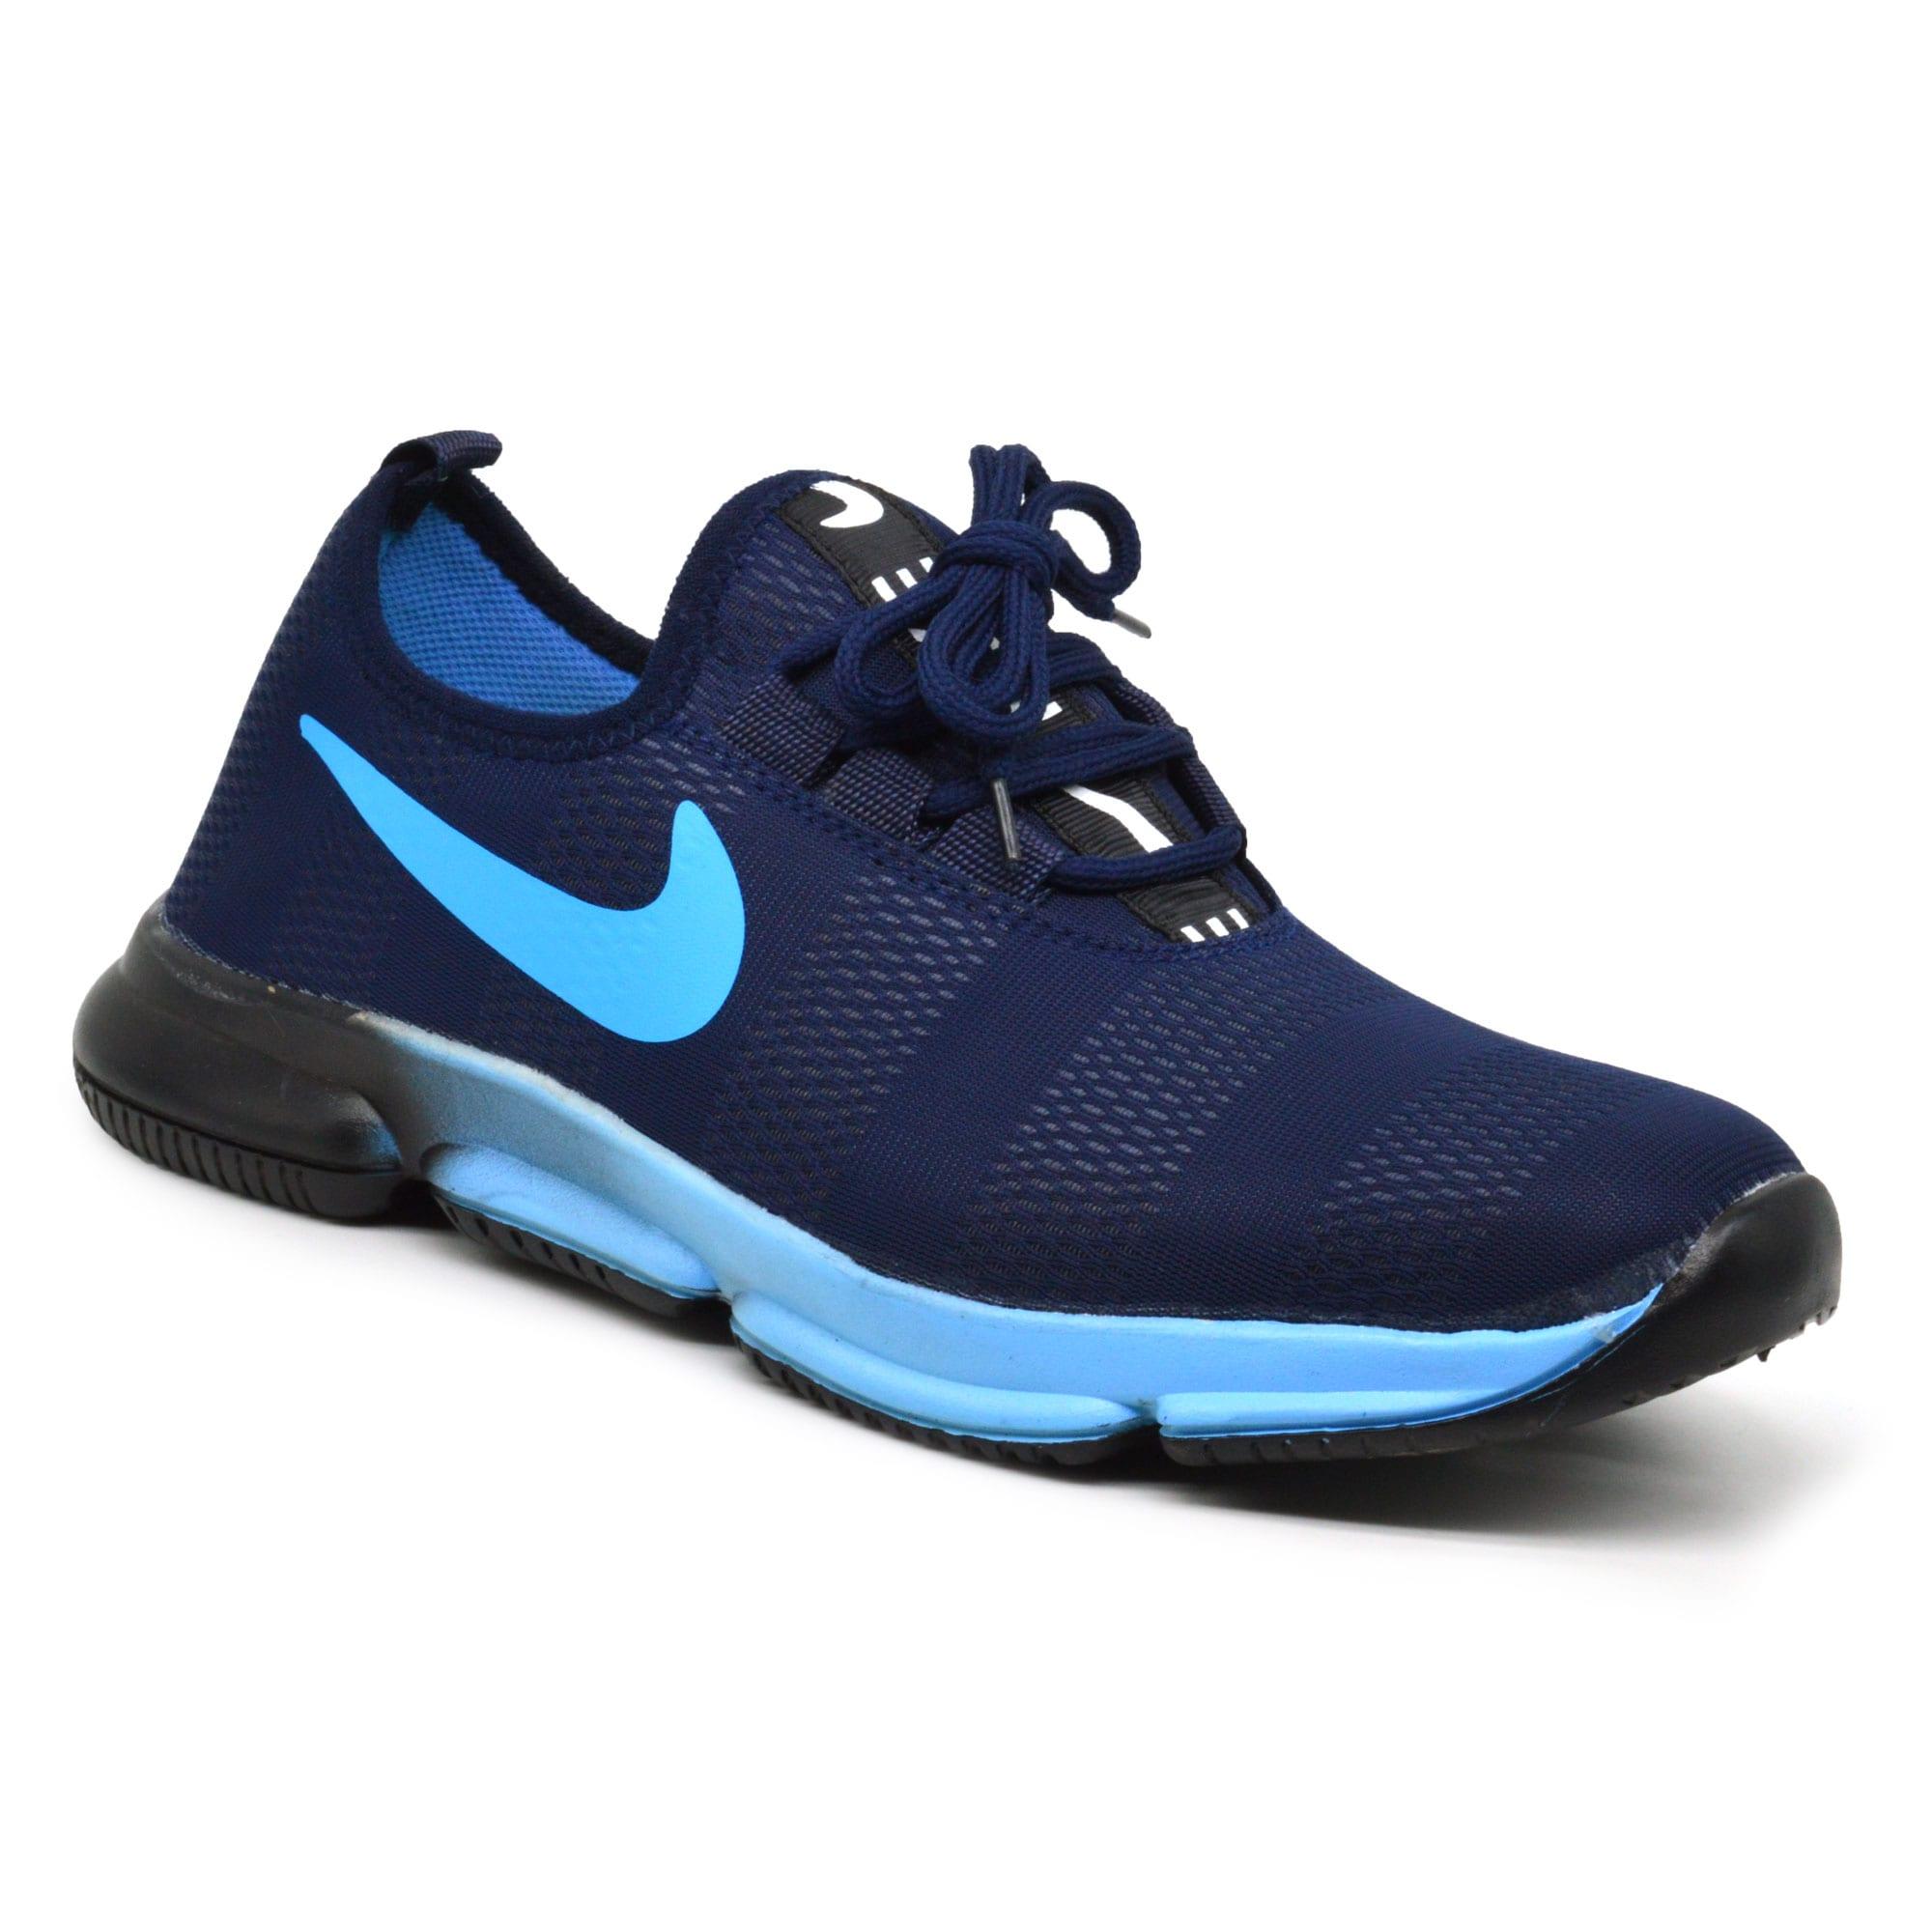 IMCOLUS5.171_BLUE OUTDOOR WEAR & FLEXIBLE MENS Sports Shoes SHOES  IMCOLUS5.171_BLUE (BLUE,6TO10,8 PAIR)